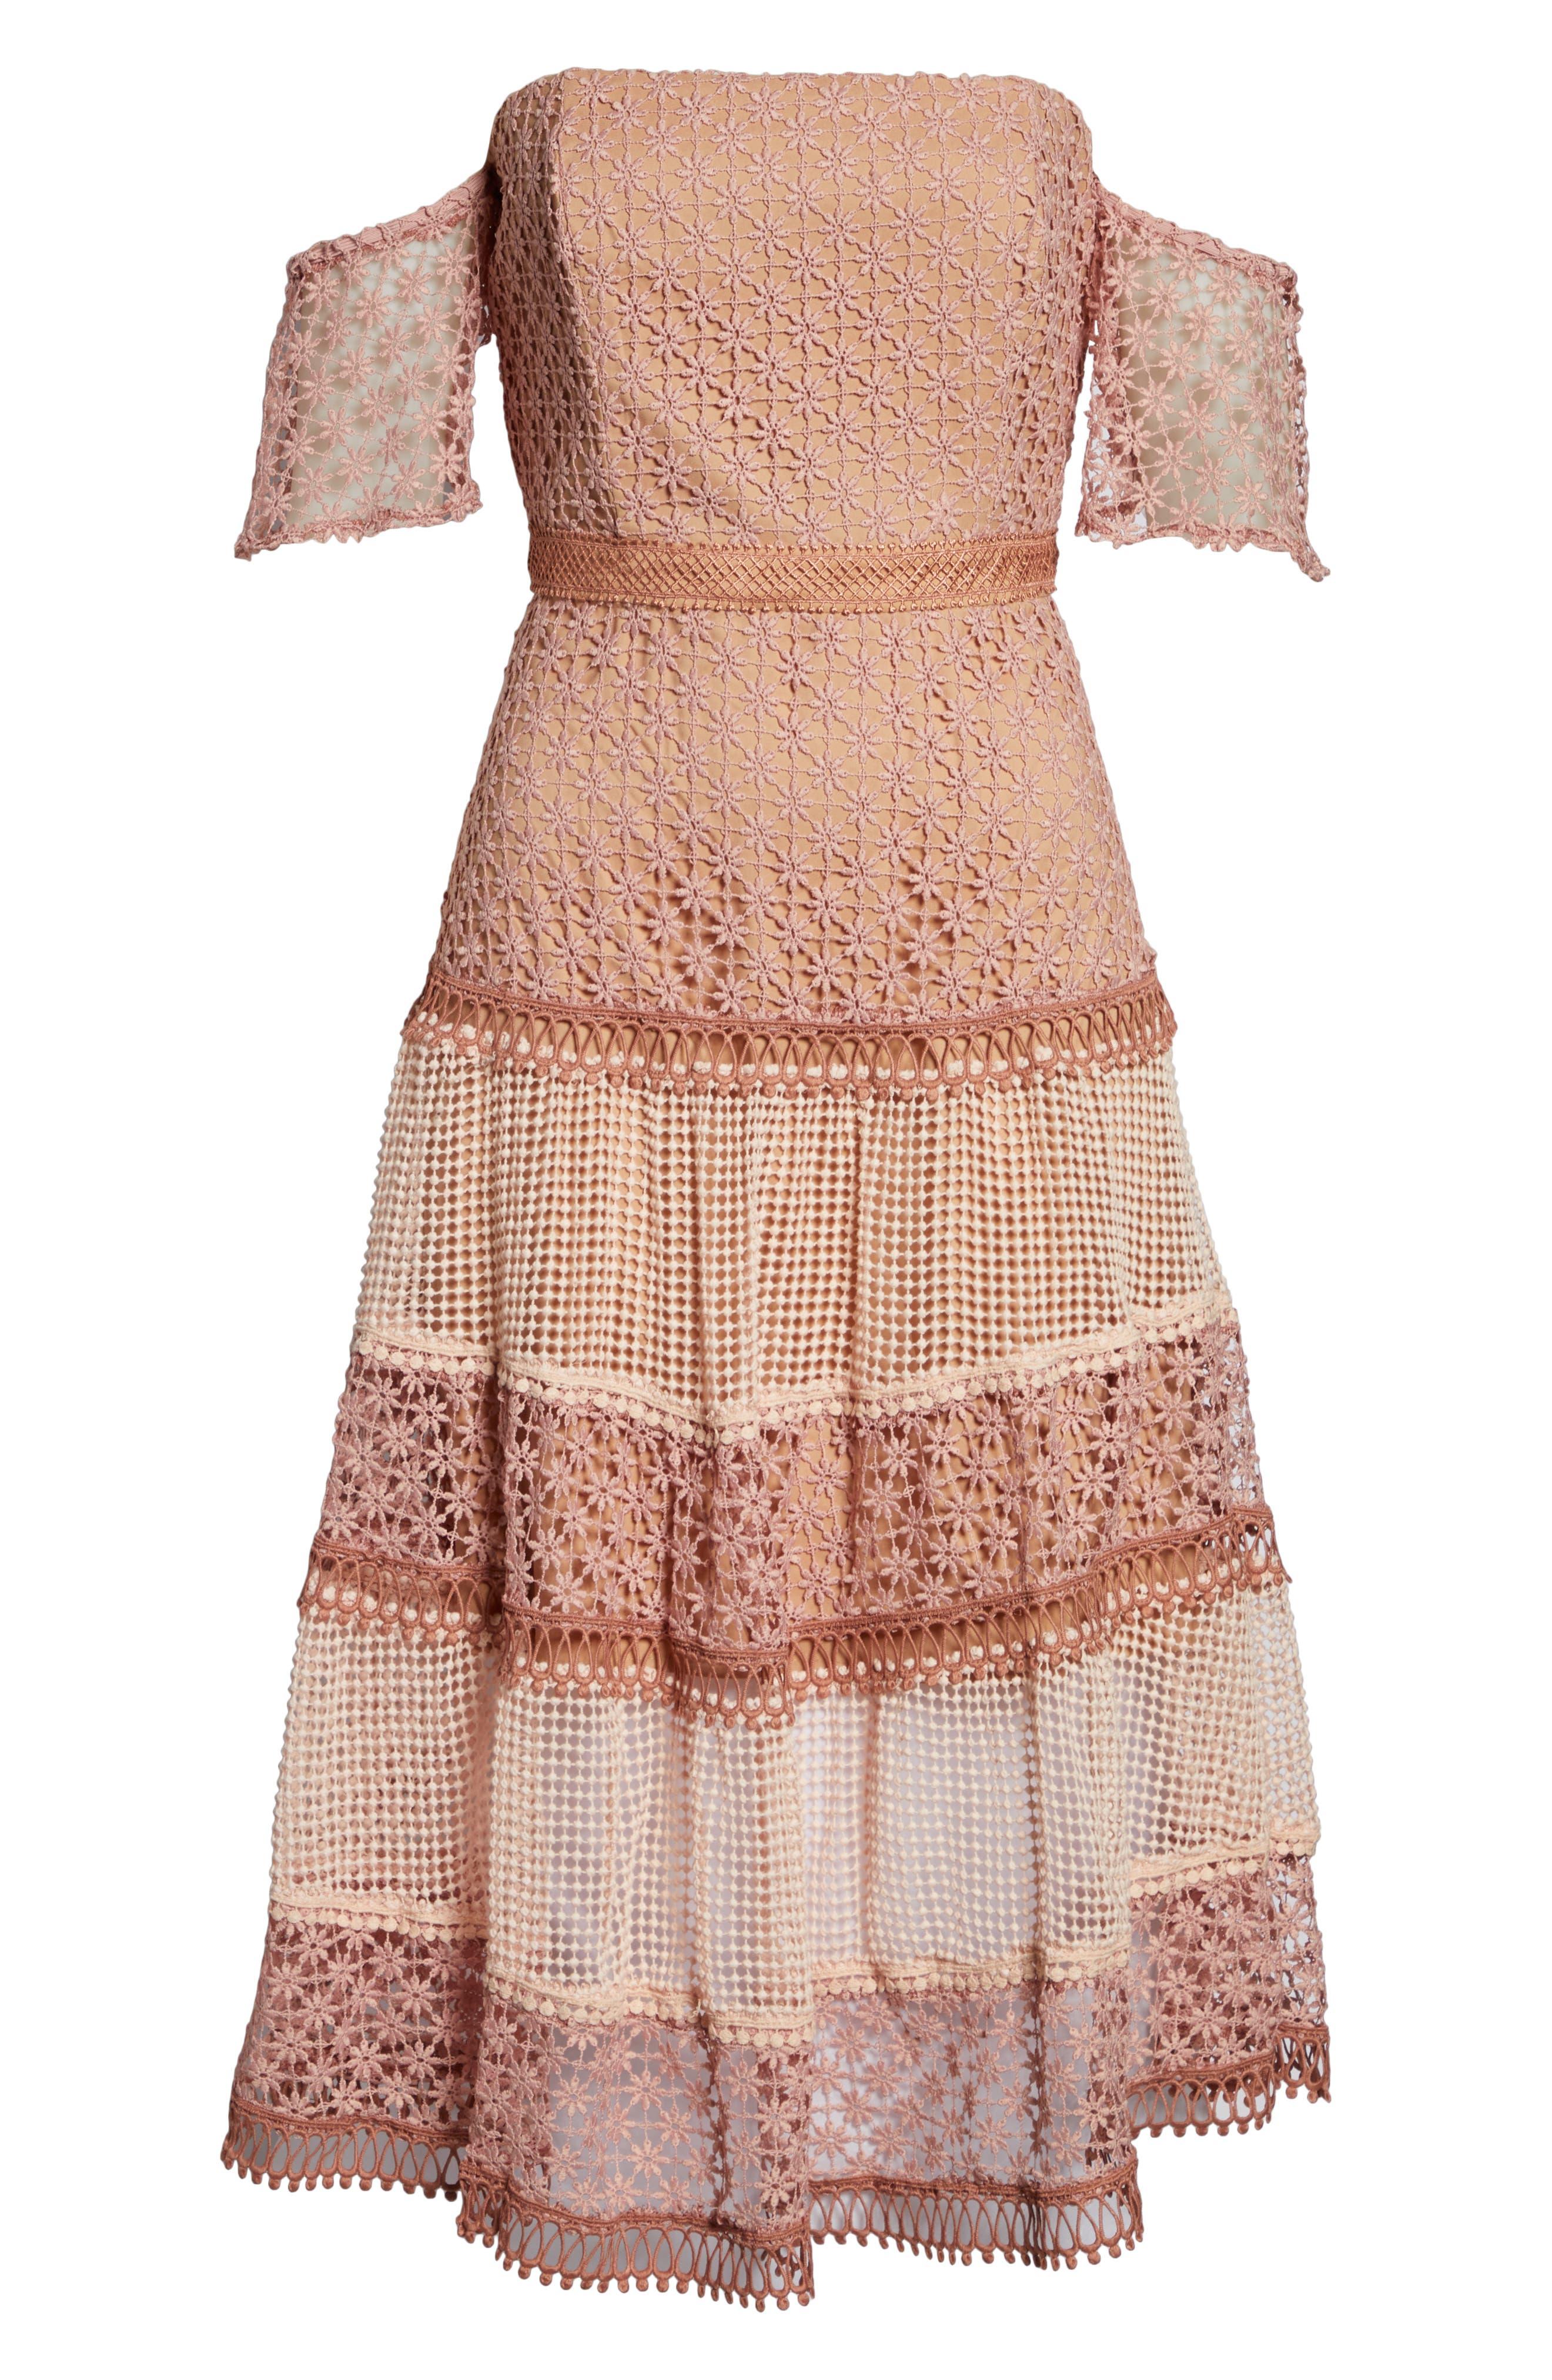 Kristen Off the Shoulder Lace Midi Dress,                             Alternate thumbnail 6, color,                             DUSTY ROSE